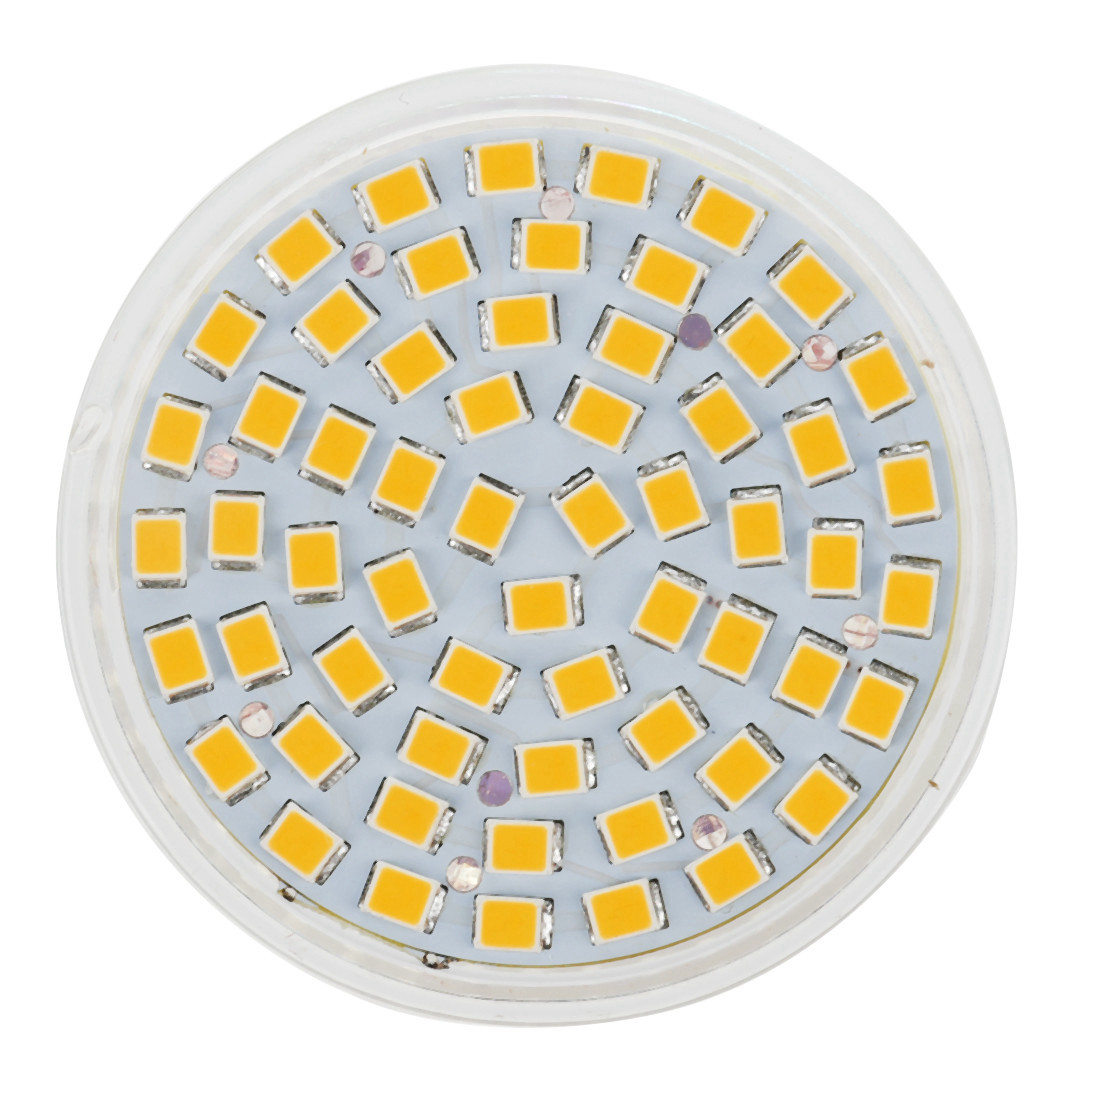 10 x MR16 GU 5.3 60 SMD LED Bulb Light Spot Light 3W Warm White ENERGY SAVING 50000 hours AC / DC 1 2V 280LM - 300LM Spotlight zhishunjia e27 3w 280lm 6000k 10 smd 2835 led white light bulb white 85 265v